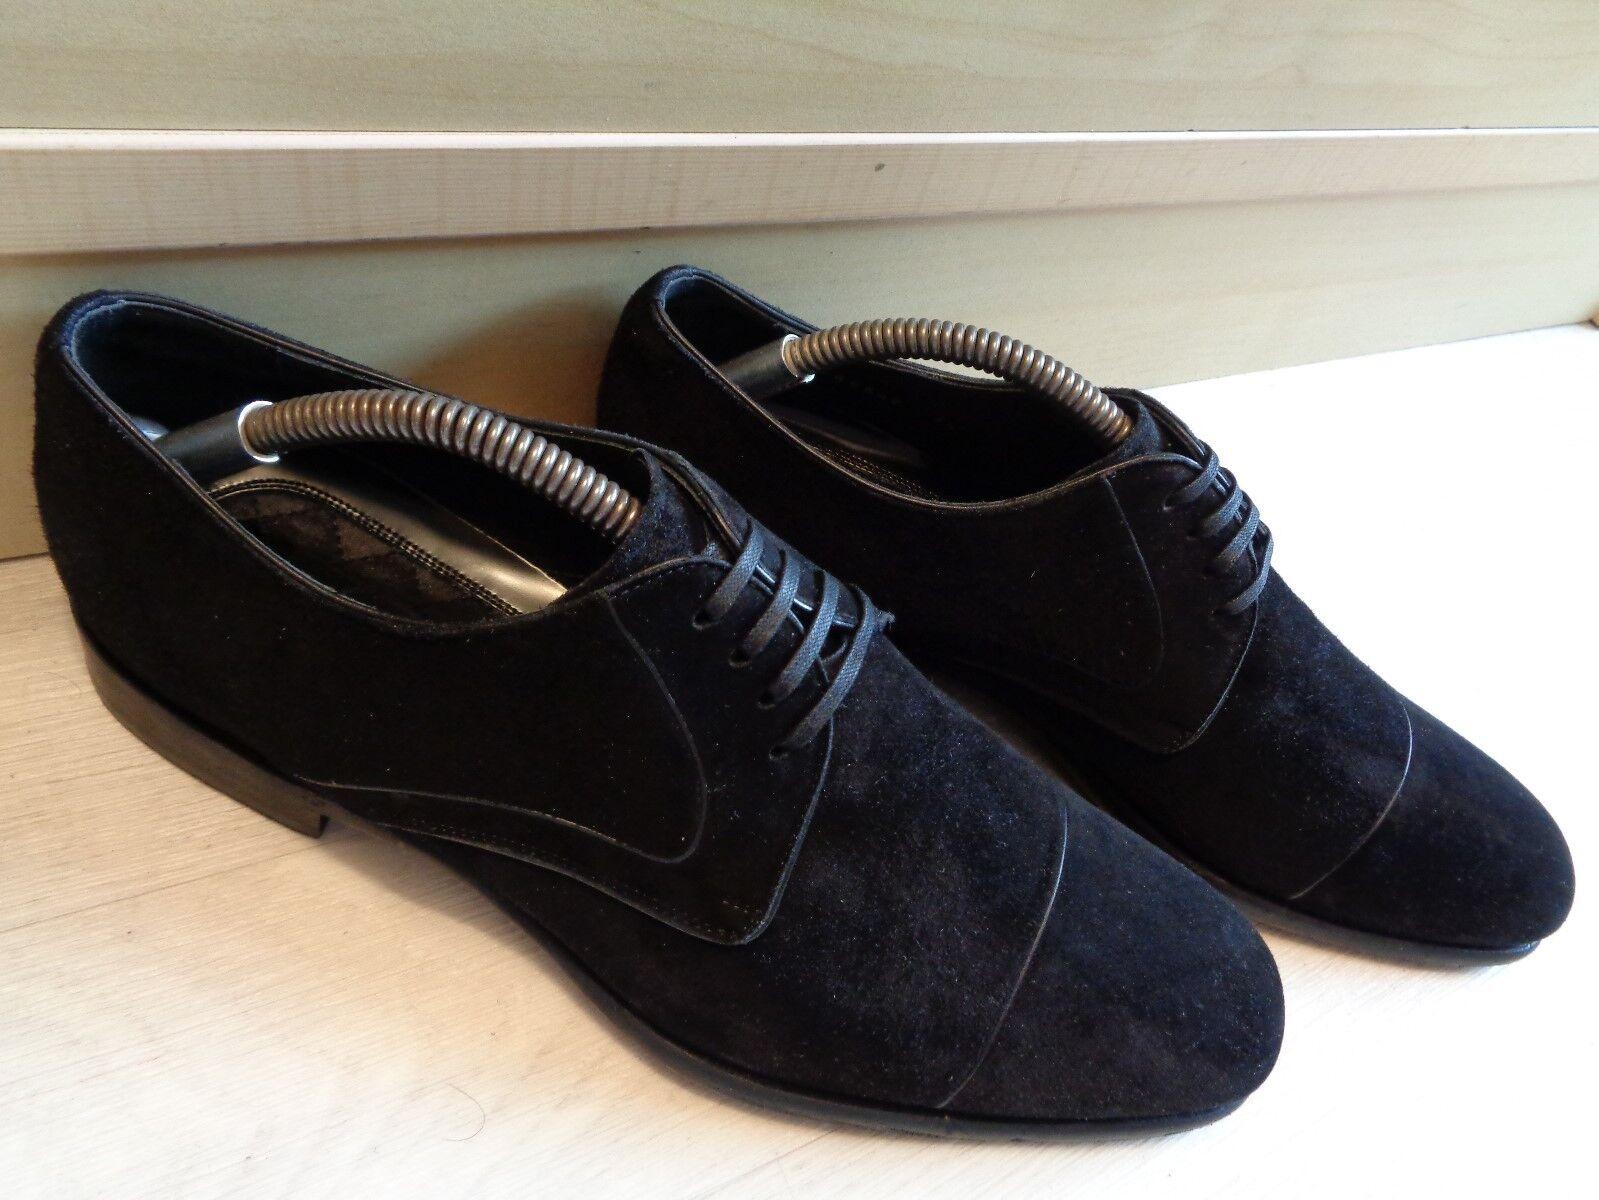 Dolce Dolce Dolce & Gabbana schwarz suede cap toe derby UK 7.5 41.5 mens business dress D&G c2cc8e